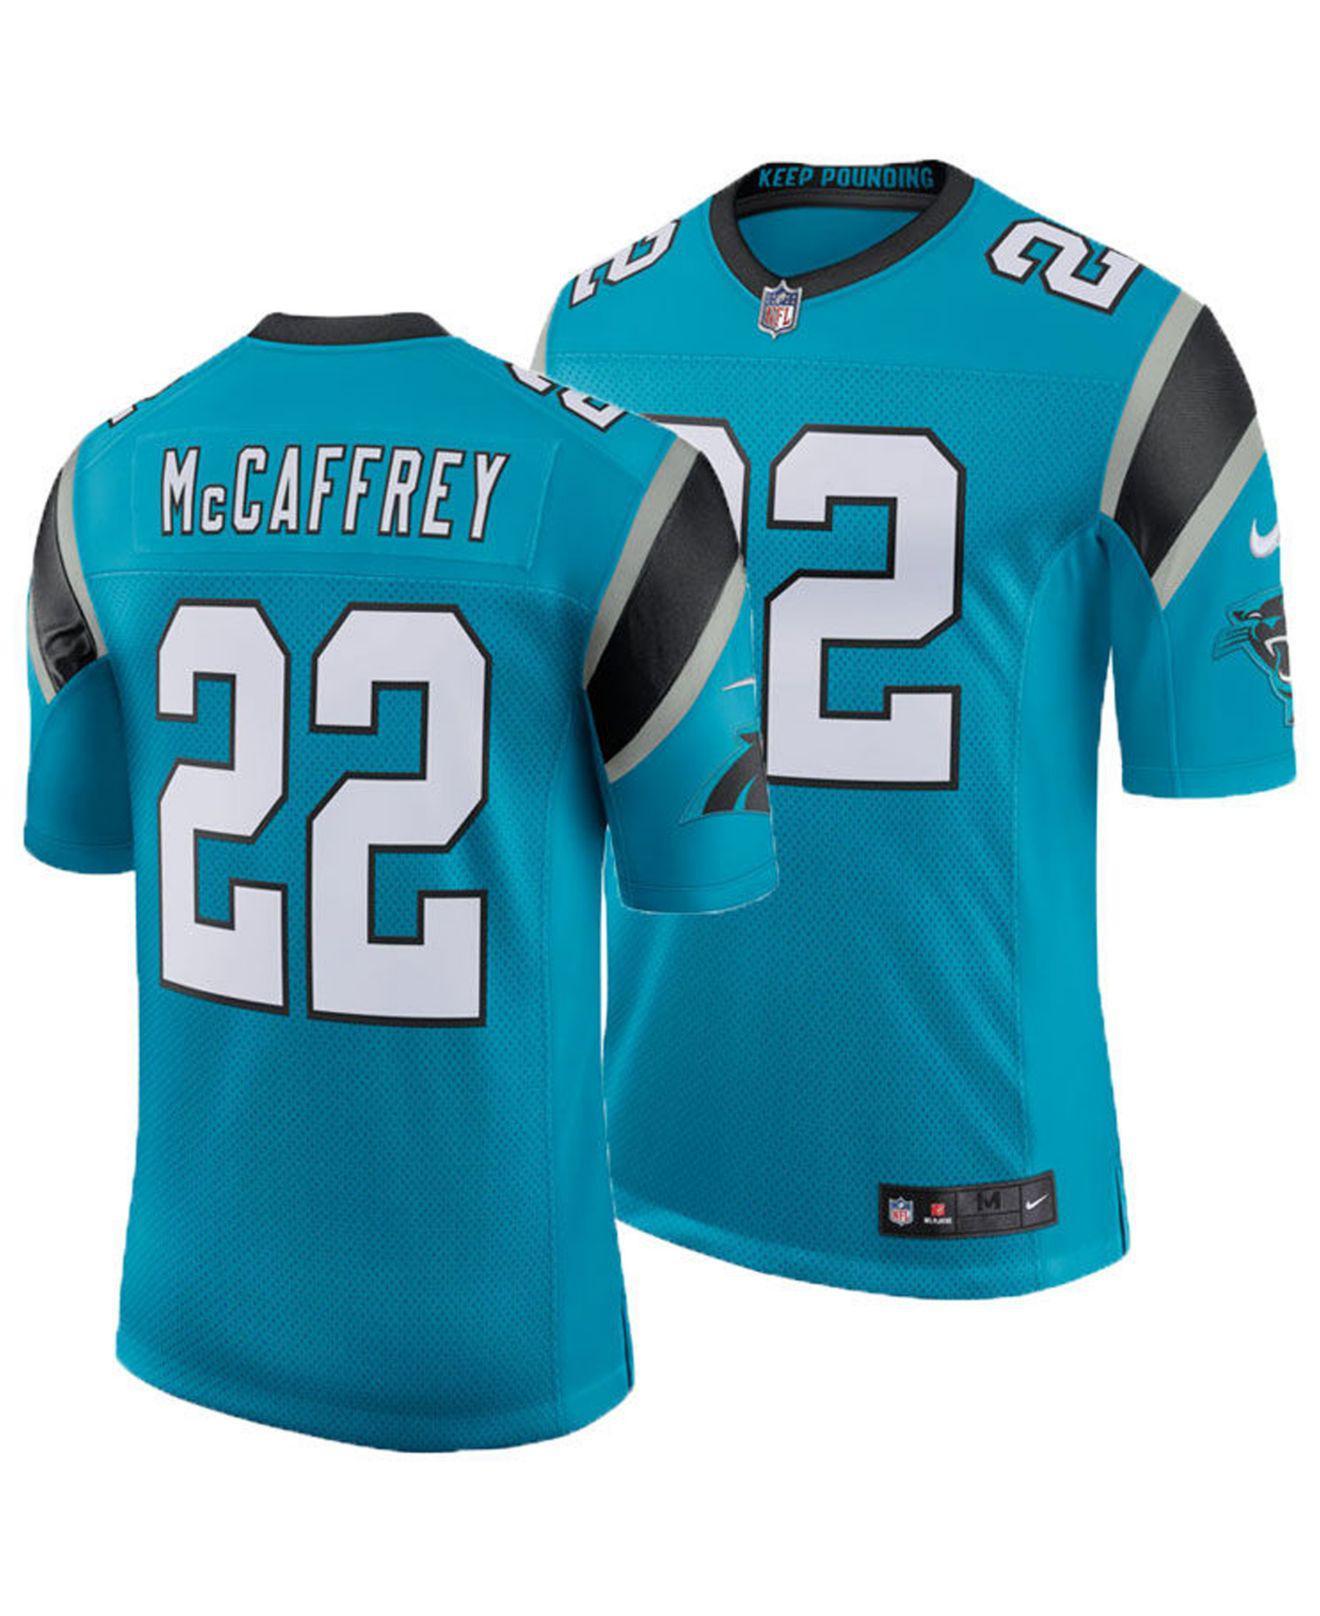 Lyst - Nike Christian Mccaffrey Carolina Panthers Limited Jersey in ... 1bf5bcc1b